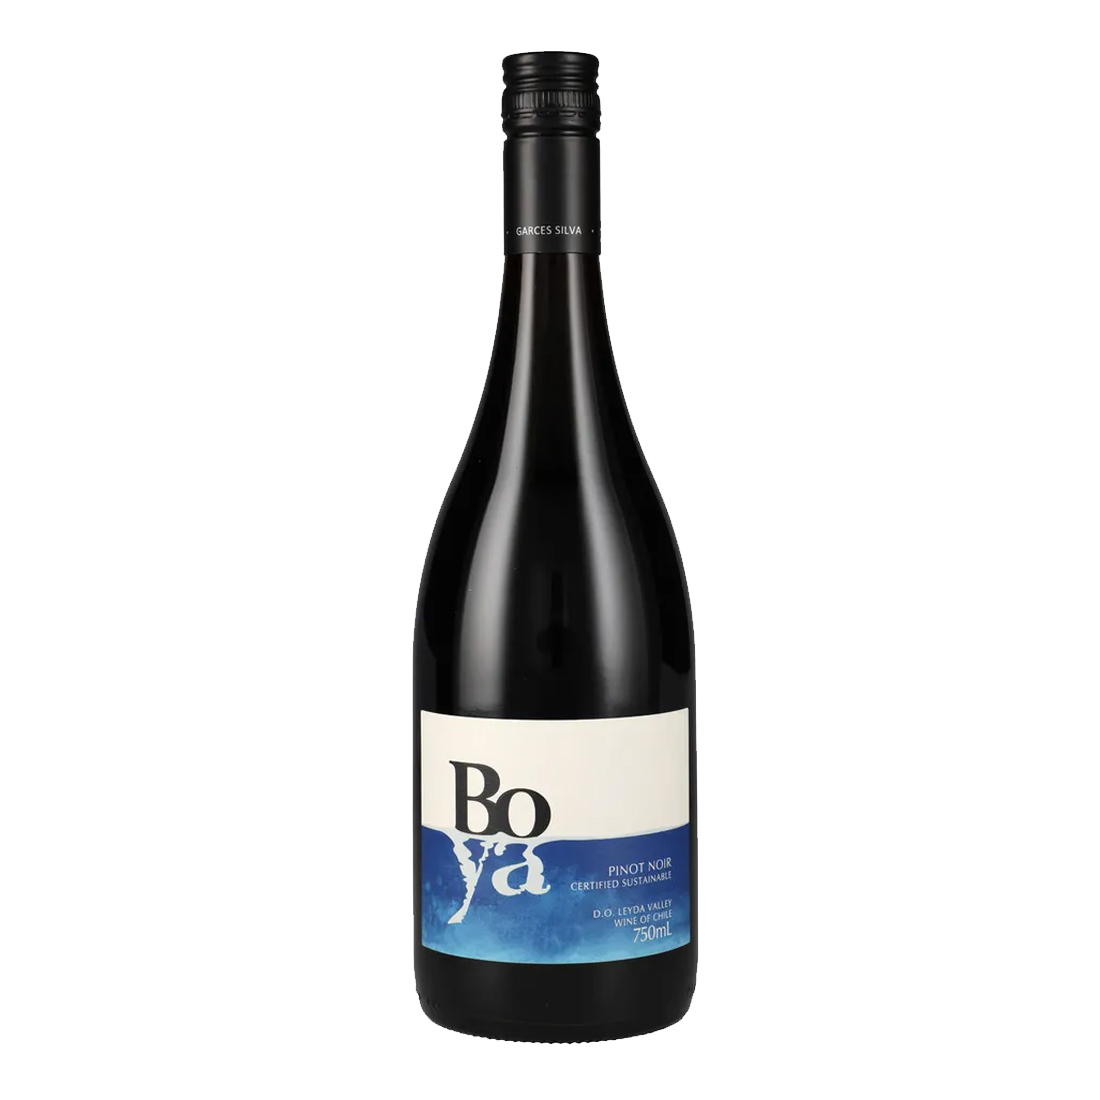 Vinho Boya Pinot Noir 750 ml